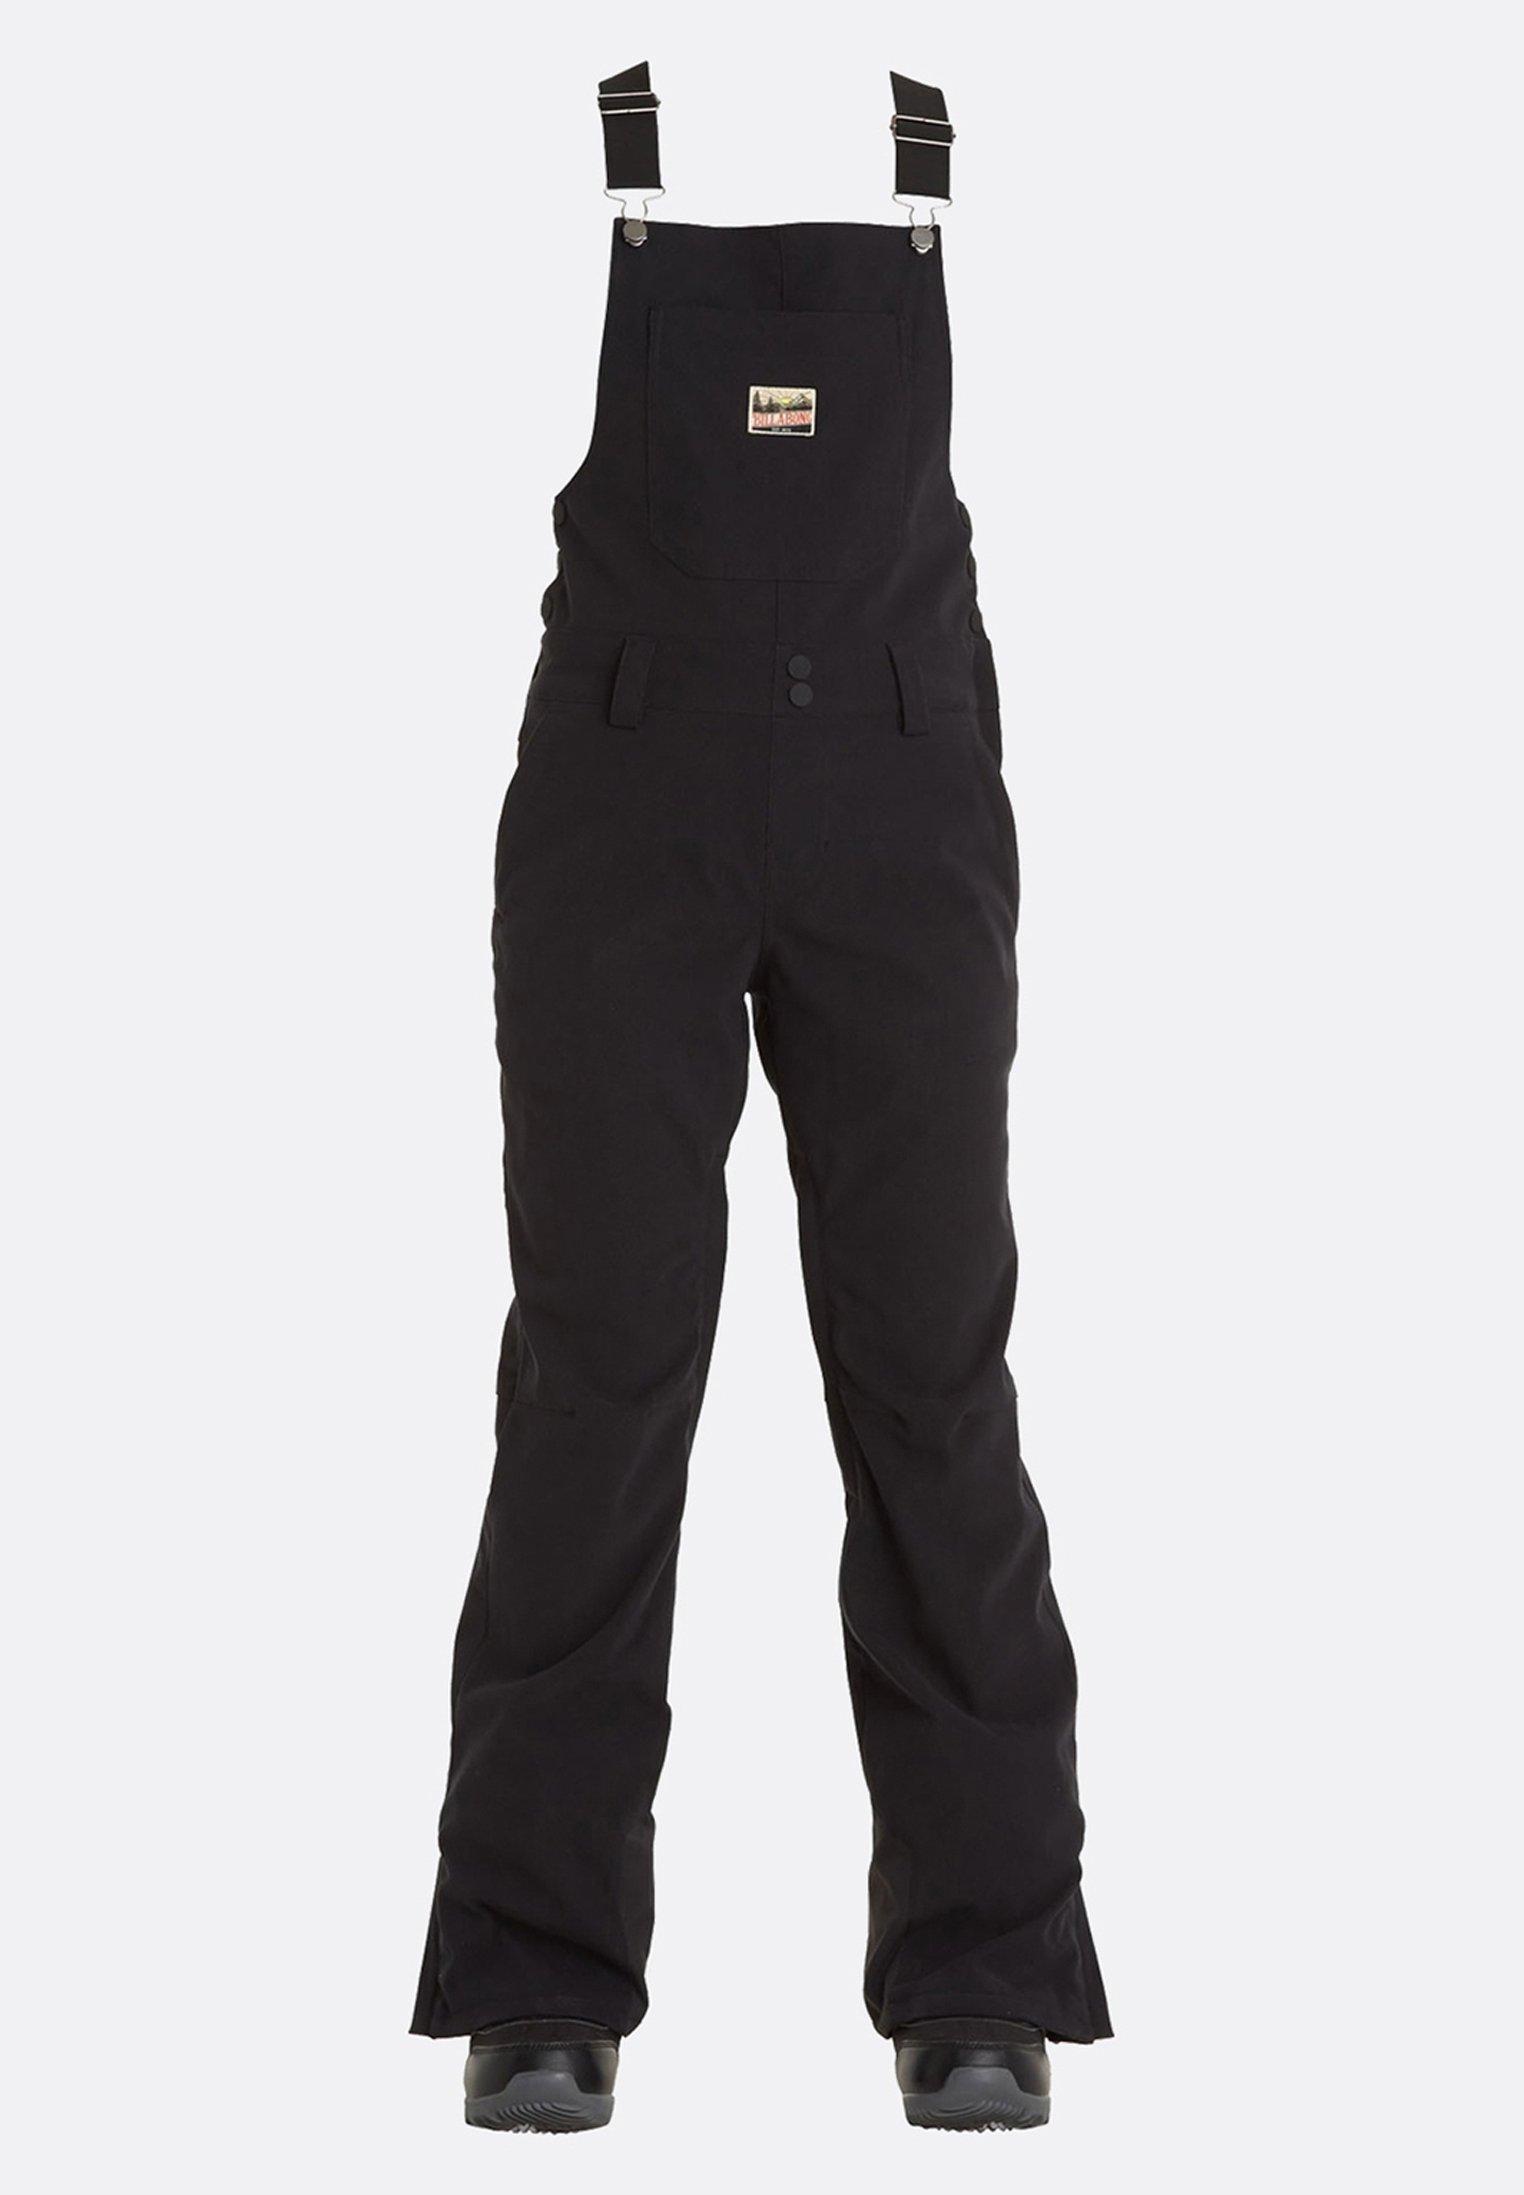 Femme Pantalon de ski